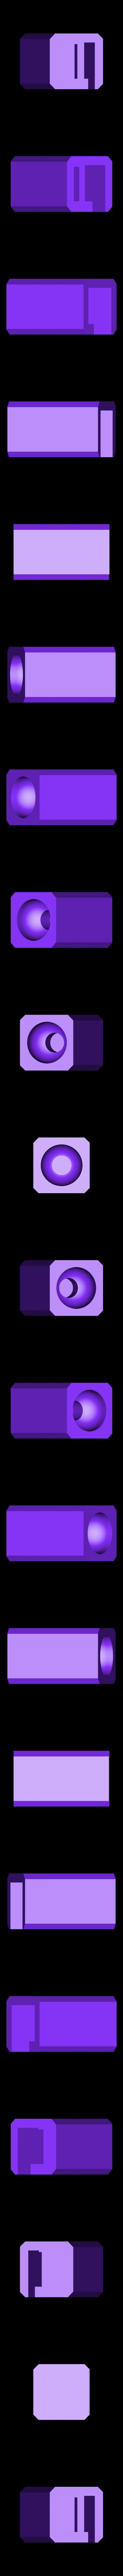 Arm_Lower_L_v2.STL Download STL file Low Poly Optimus Prime • Model to 3D print, biglildesign